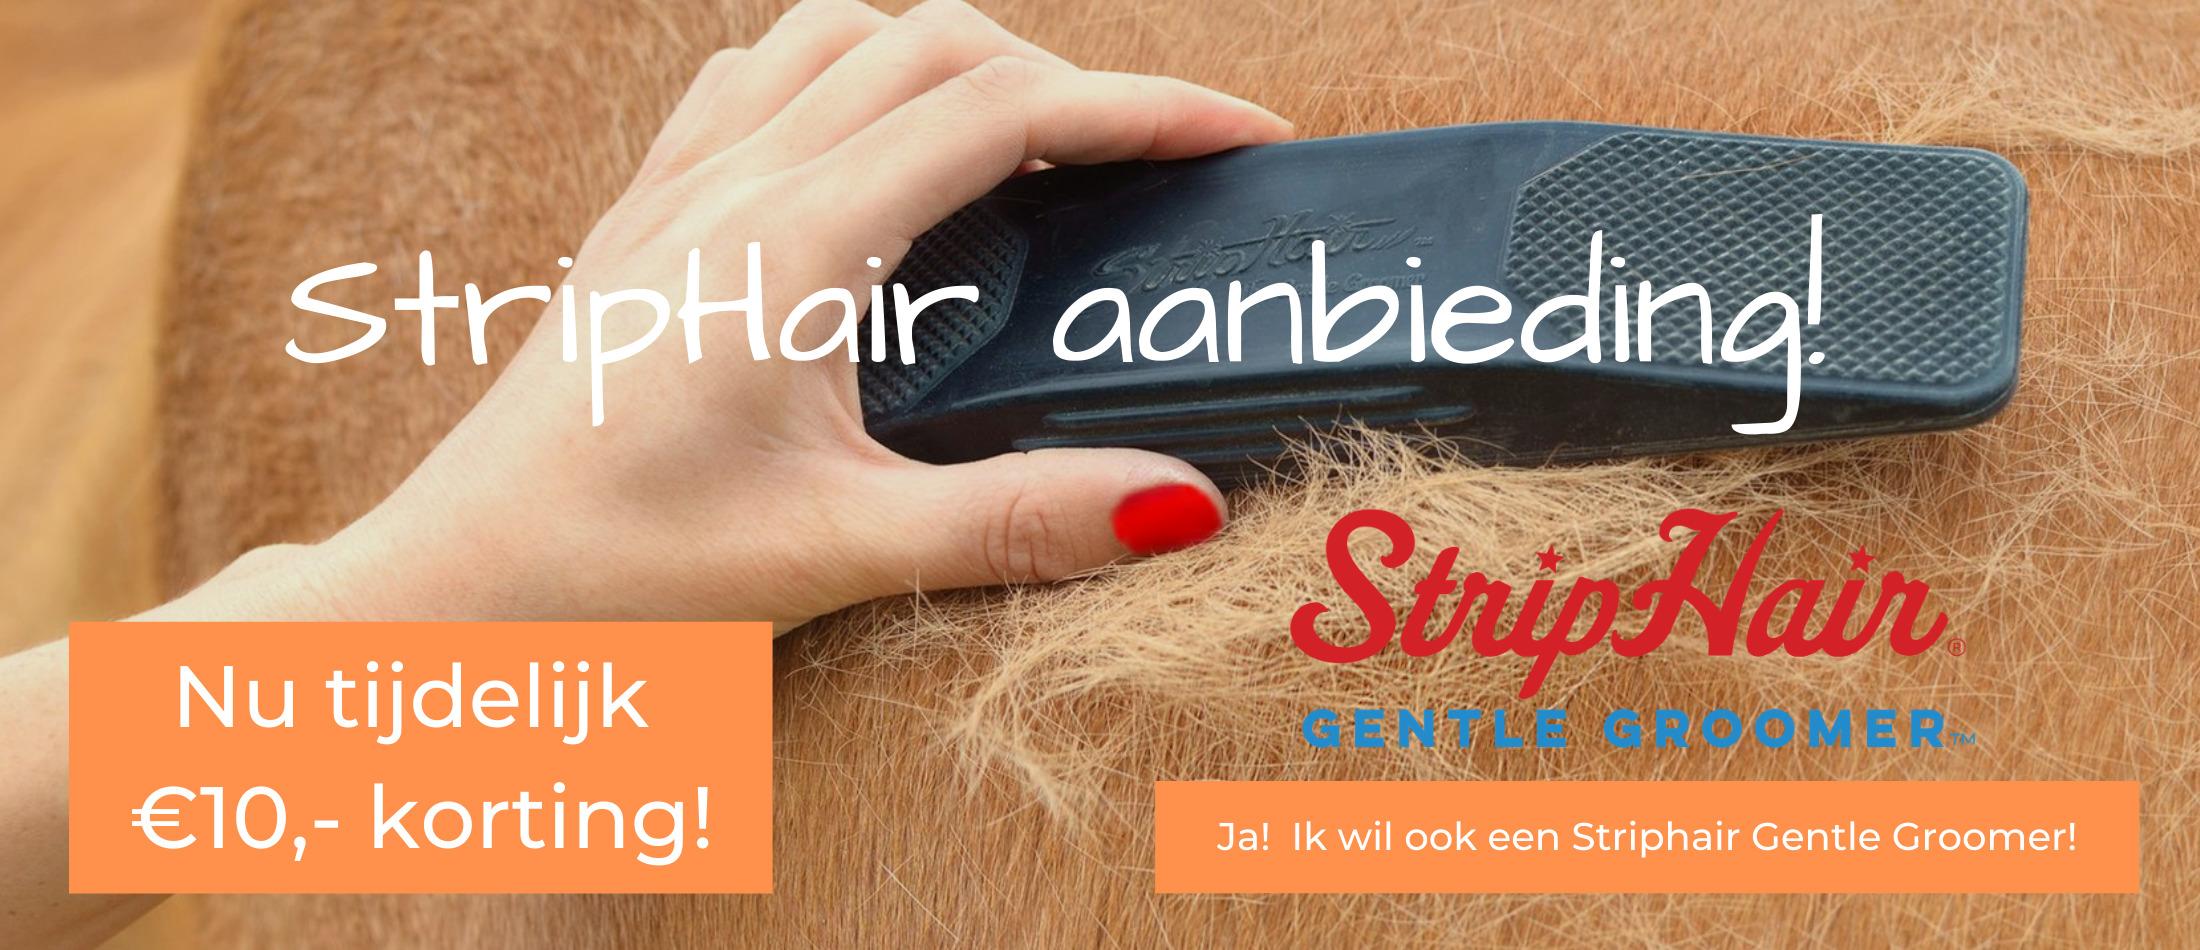 Striphair kortingsactie